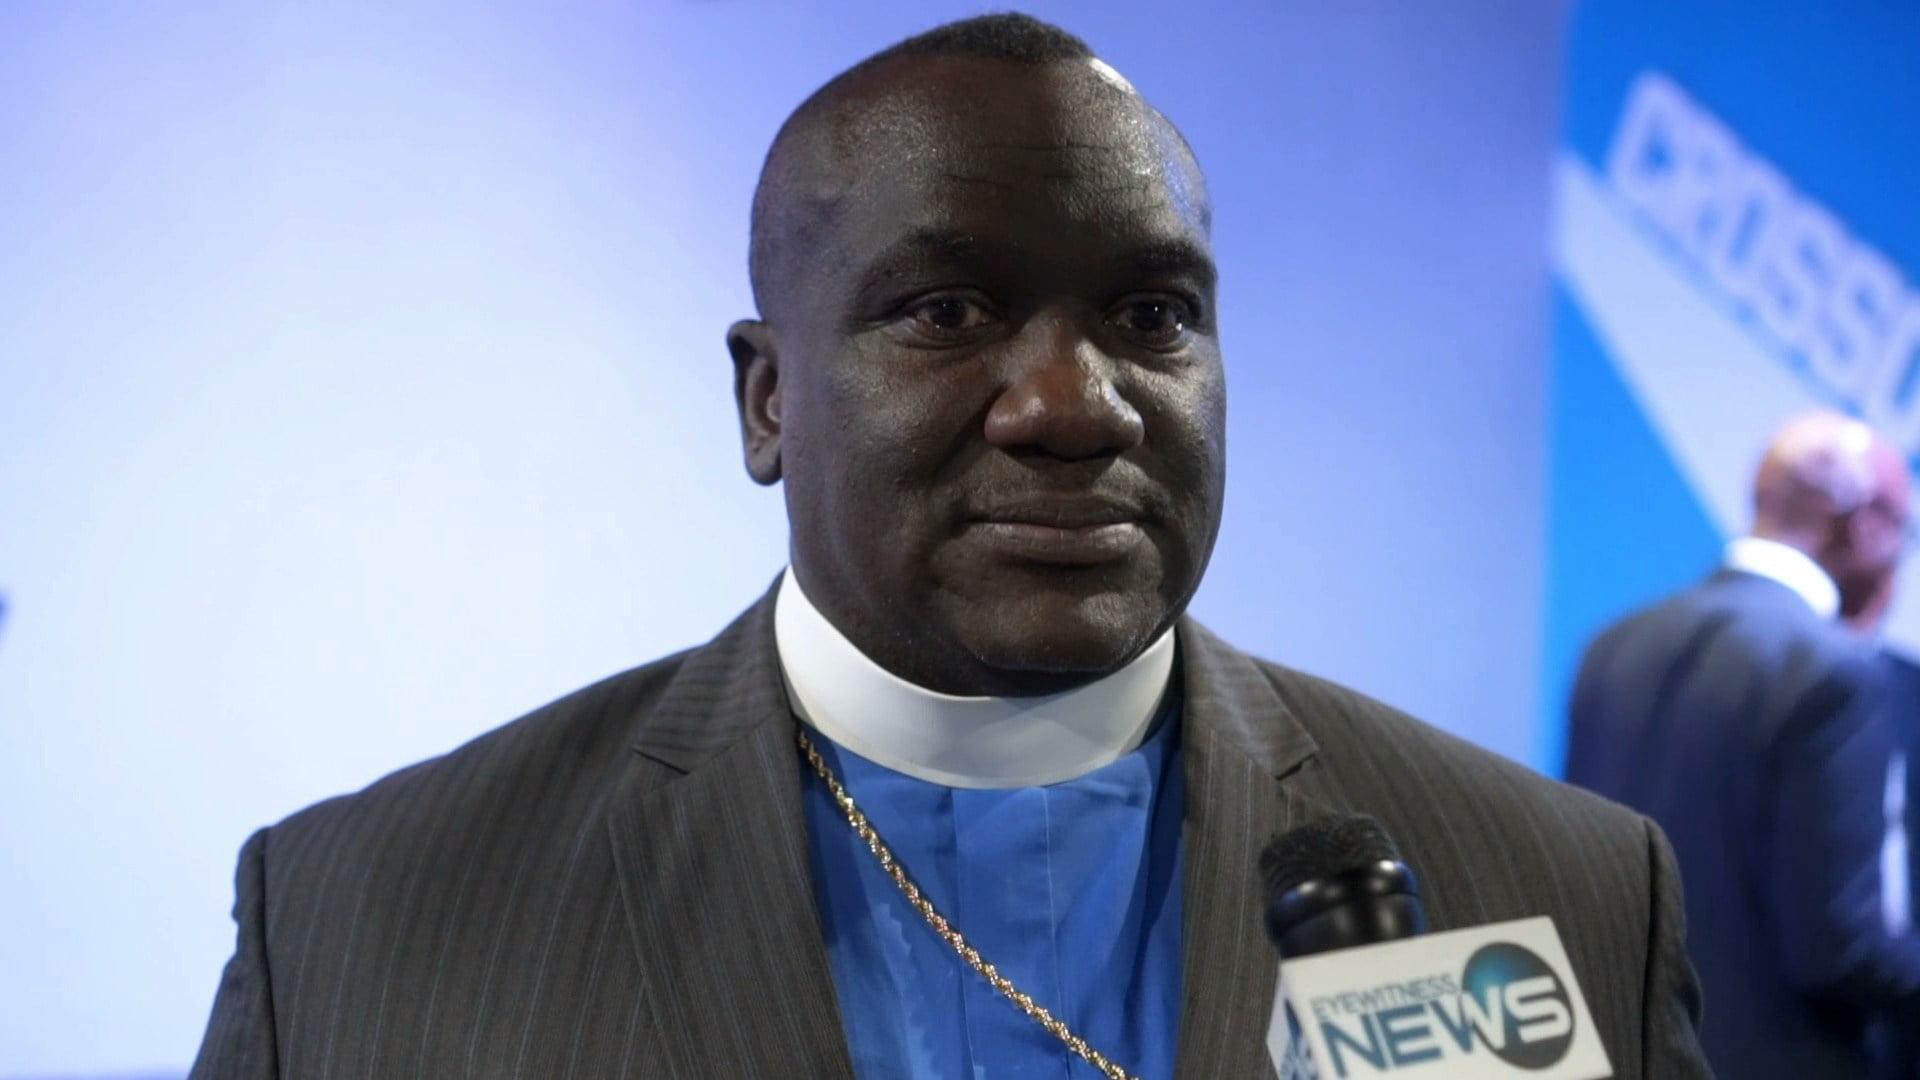 Christian Council plans showdown with Bahamas Pride